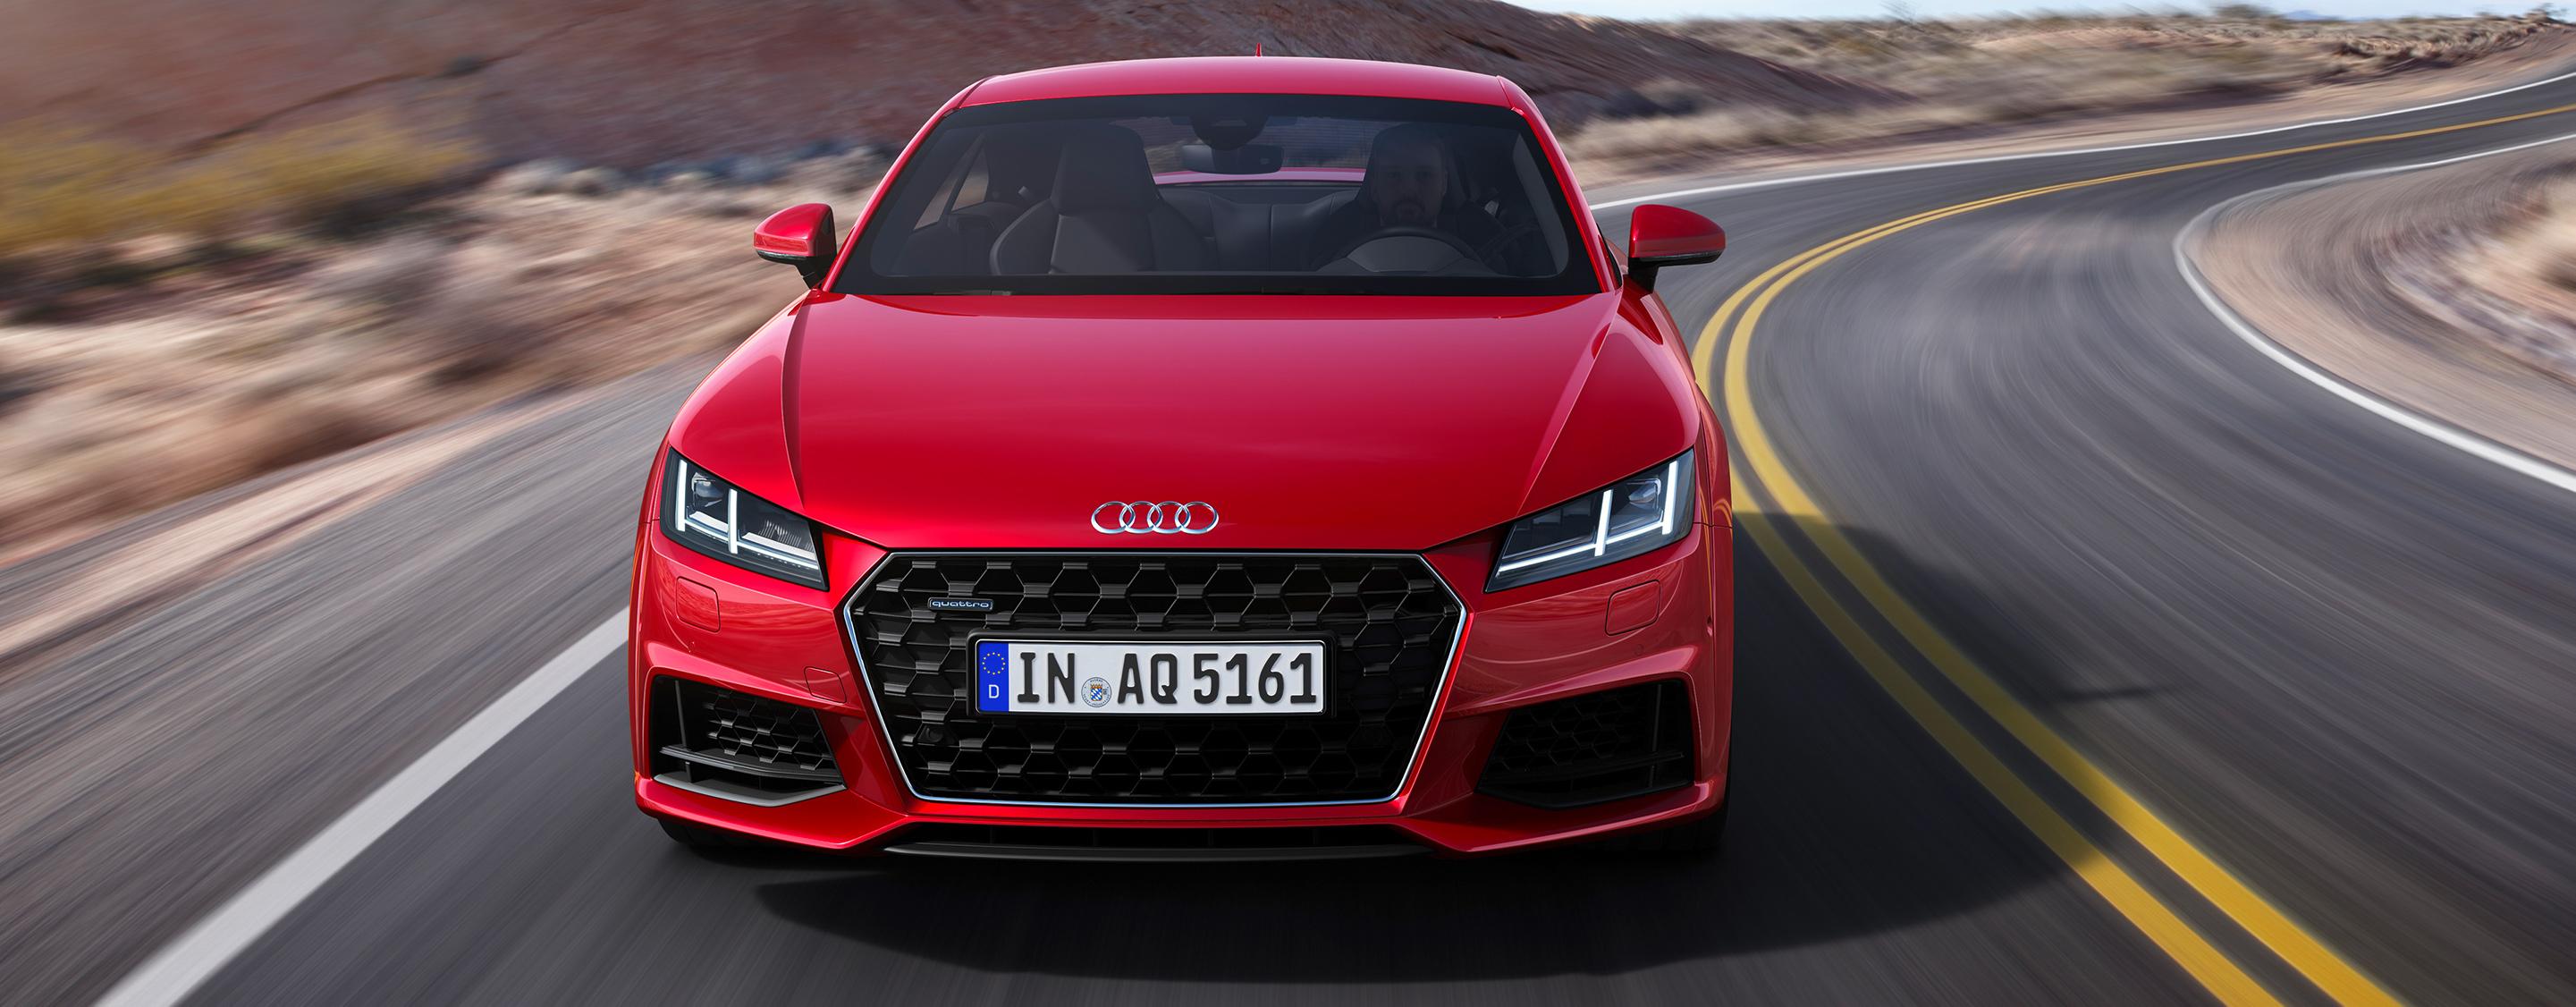 TrackWorthy-2019-Audi-TT-Coupe-11